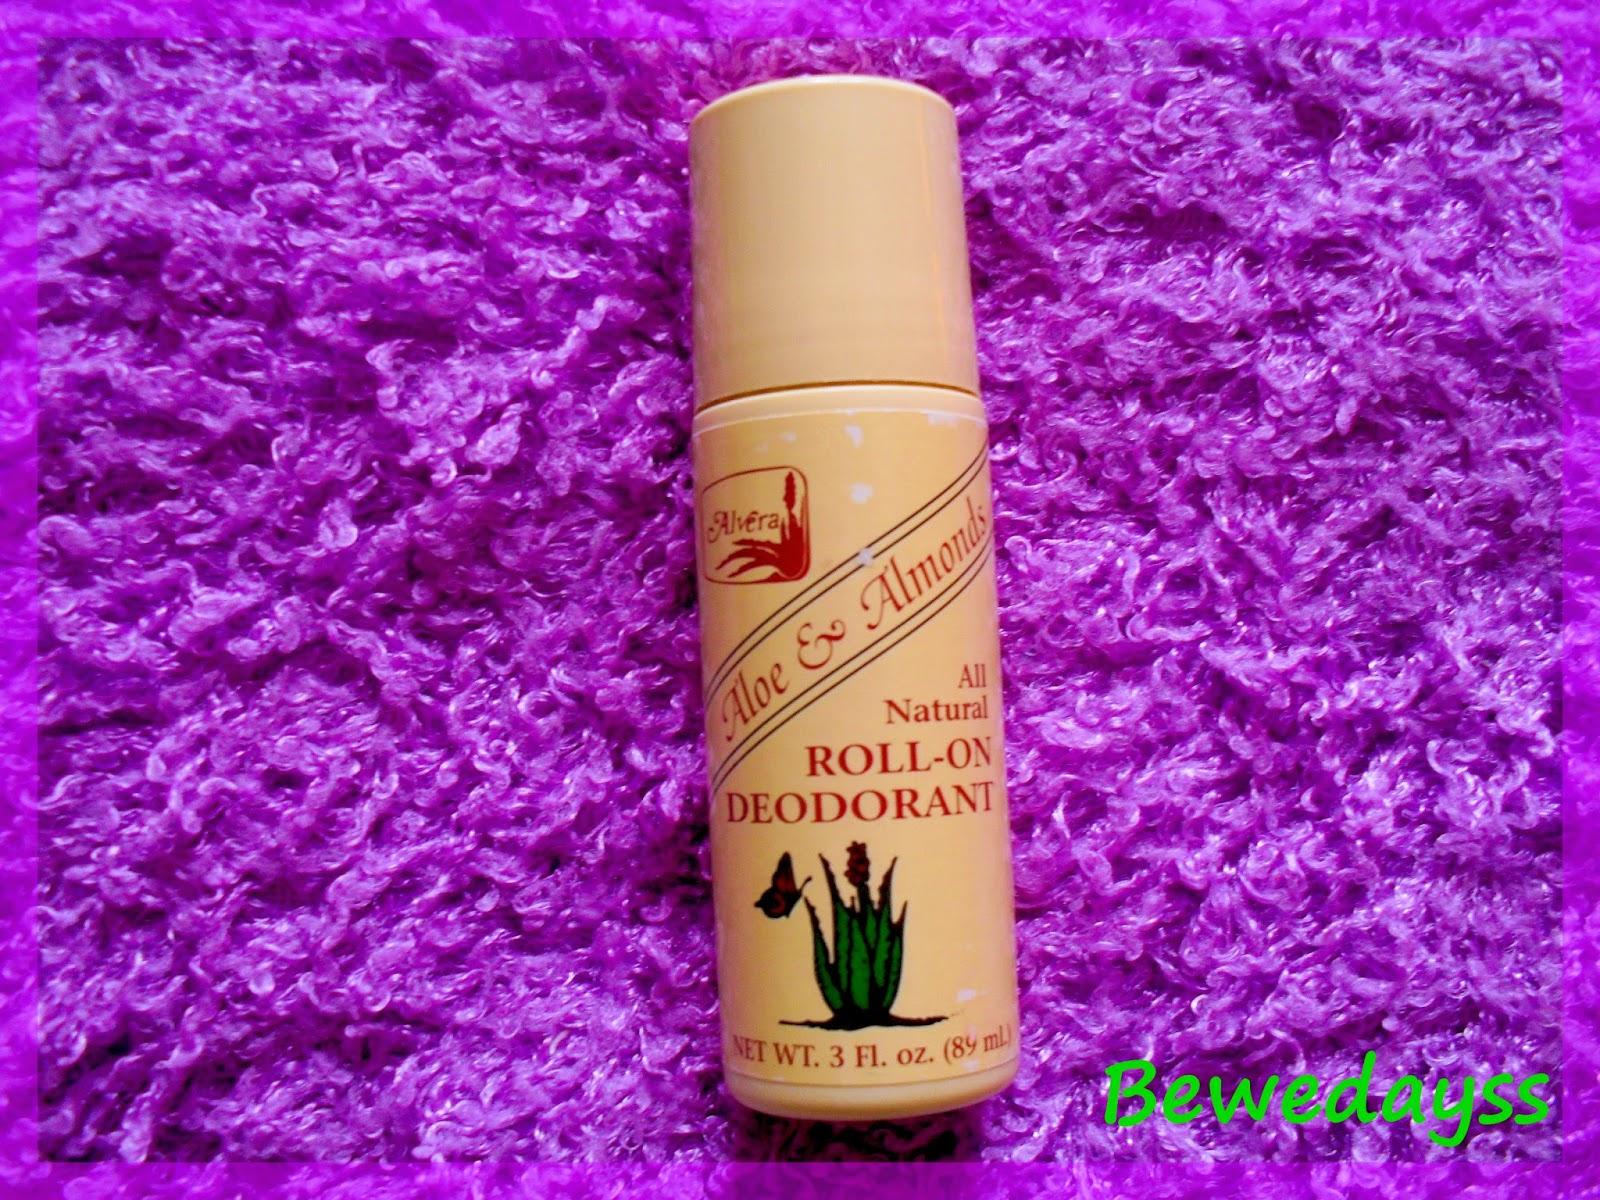 Alvera, Aloe & Almonds, Roll-On Deodorant